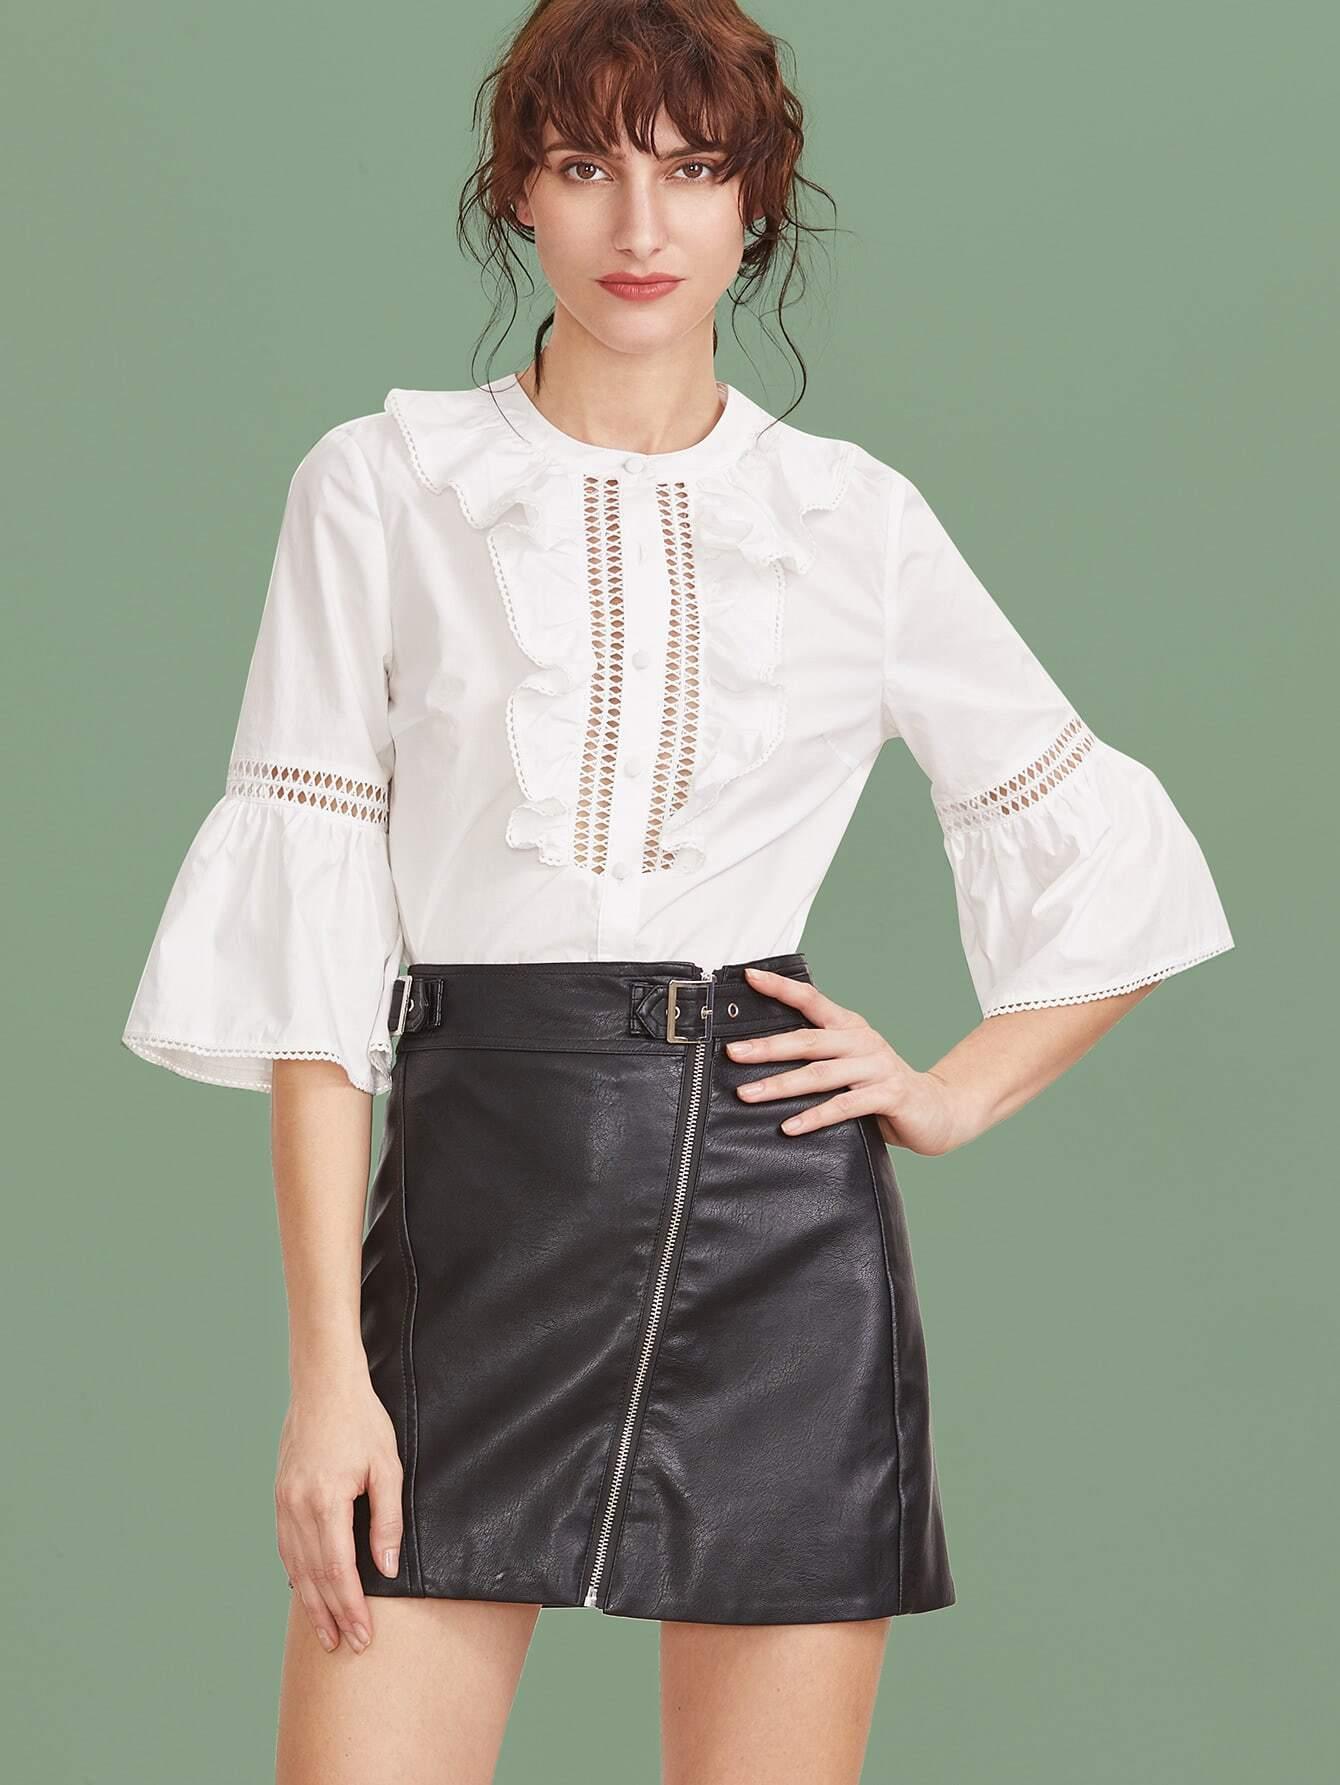 blouse161227715_2